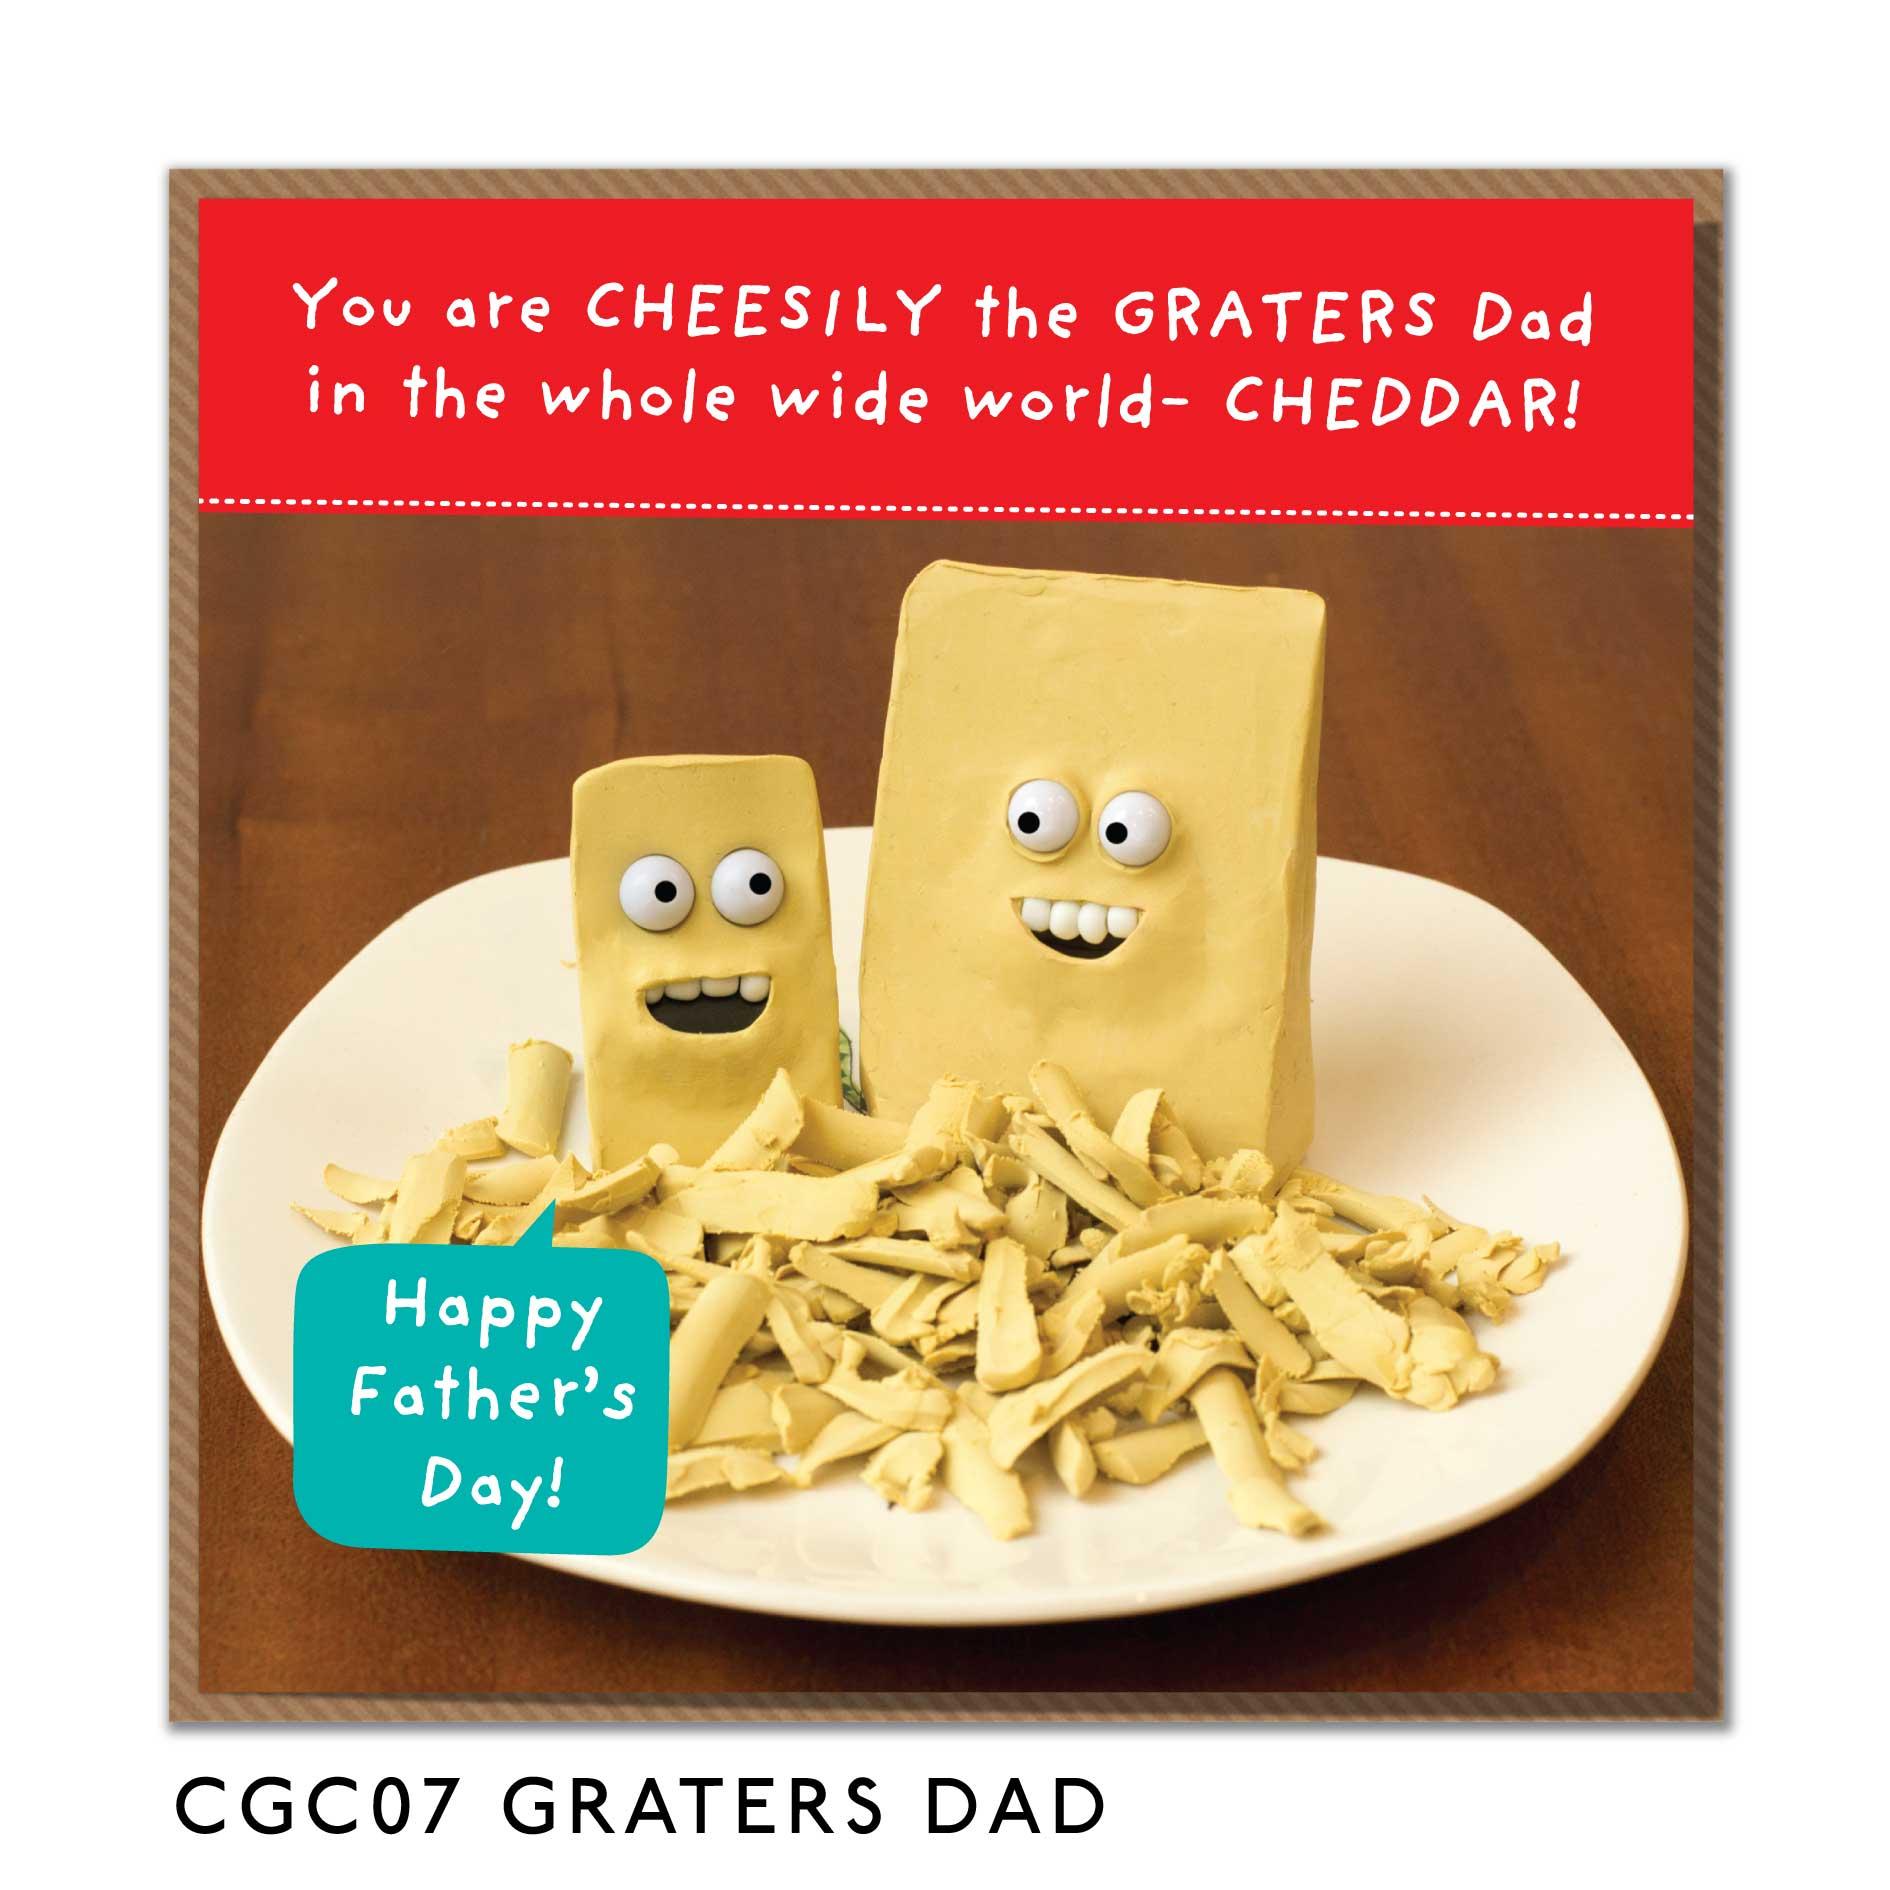 CGC07-GRATERS-DAD.jpg